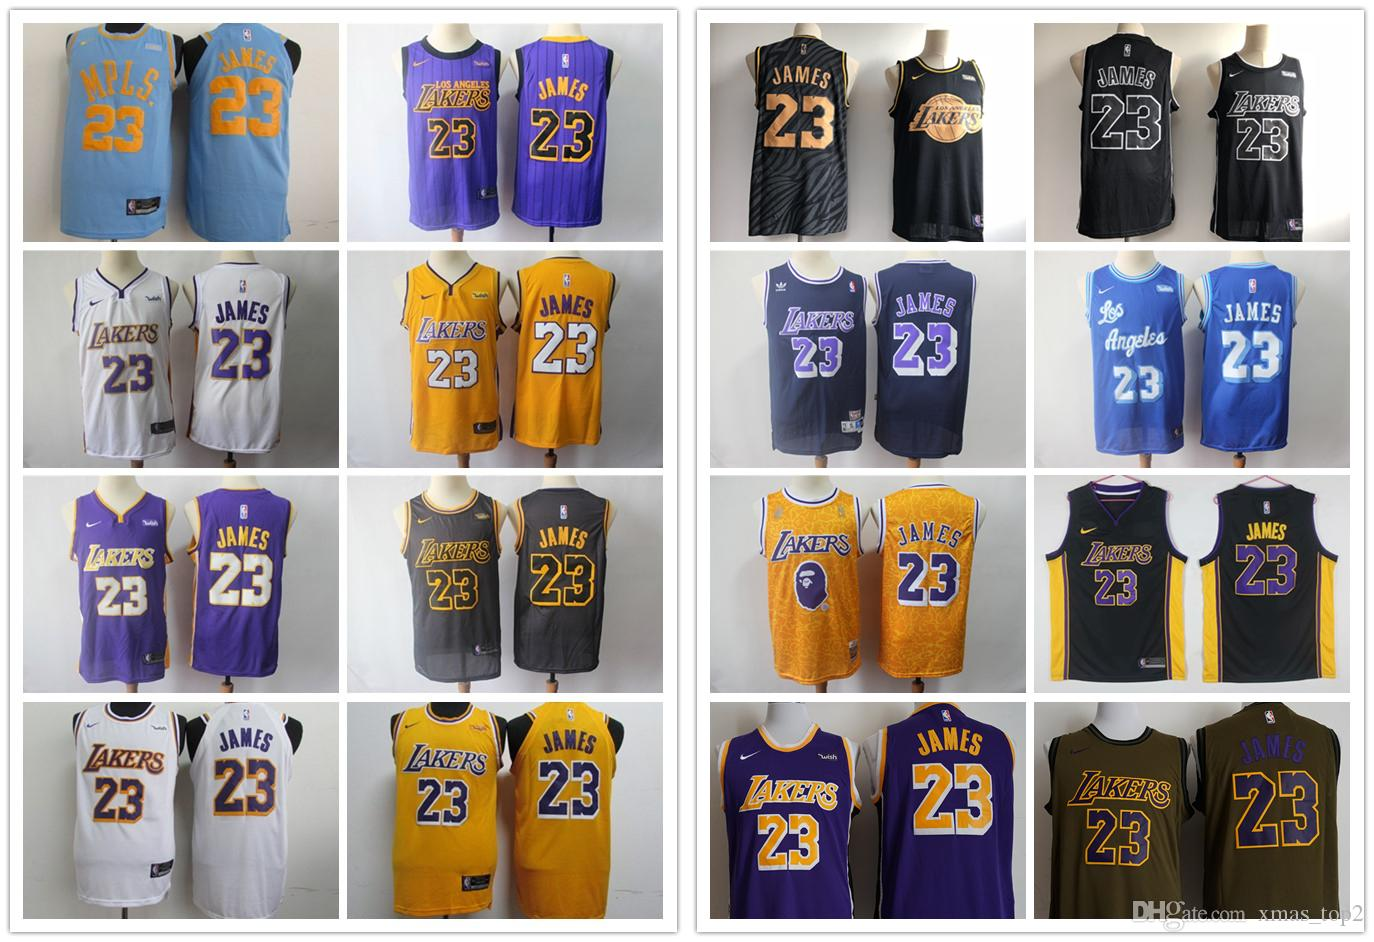 521a78b73e41 2019 Mens 23 LeBron James Los Angeles Jerseys Lakers Retro Basketball  Jerseys Stitched New City LeBron James Jerseys Lakers Shorts Groom Wedding  Shirt ...